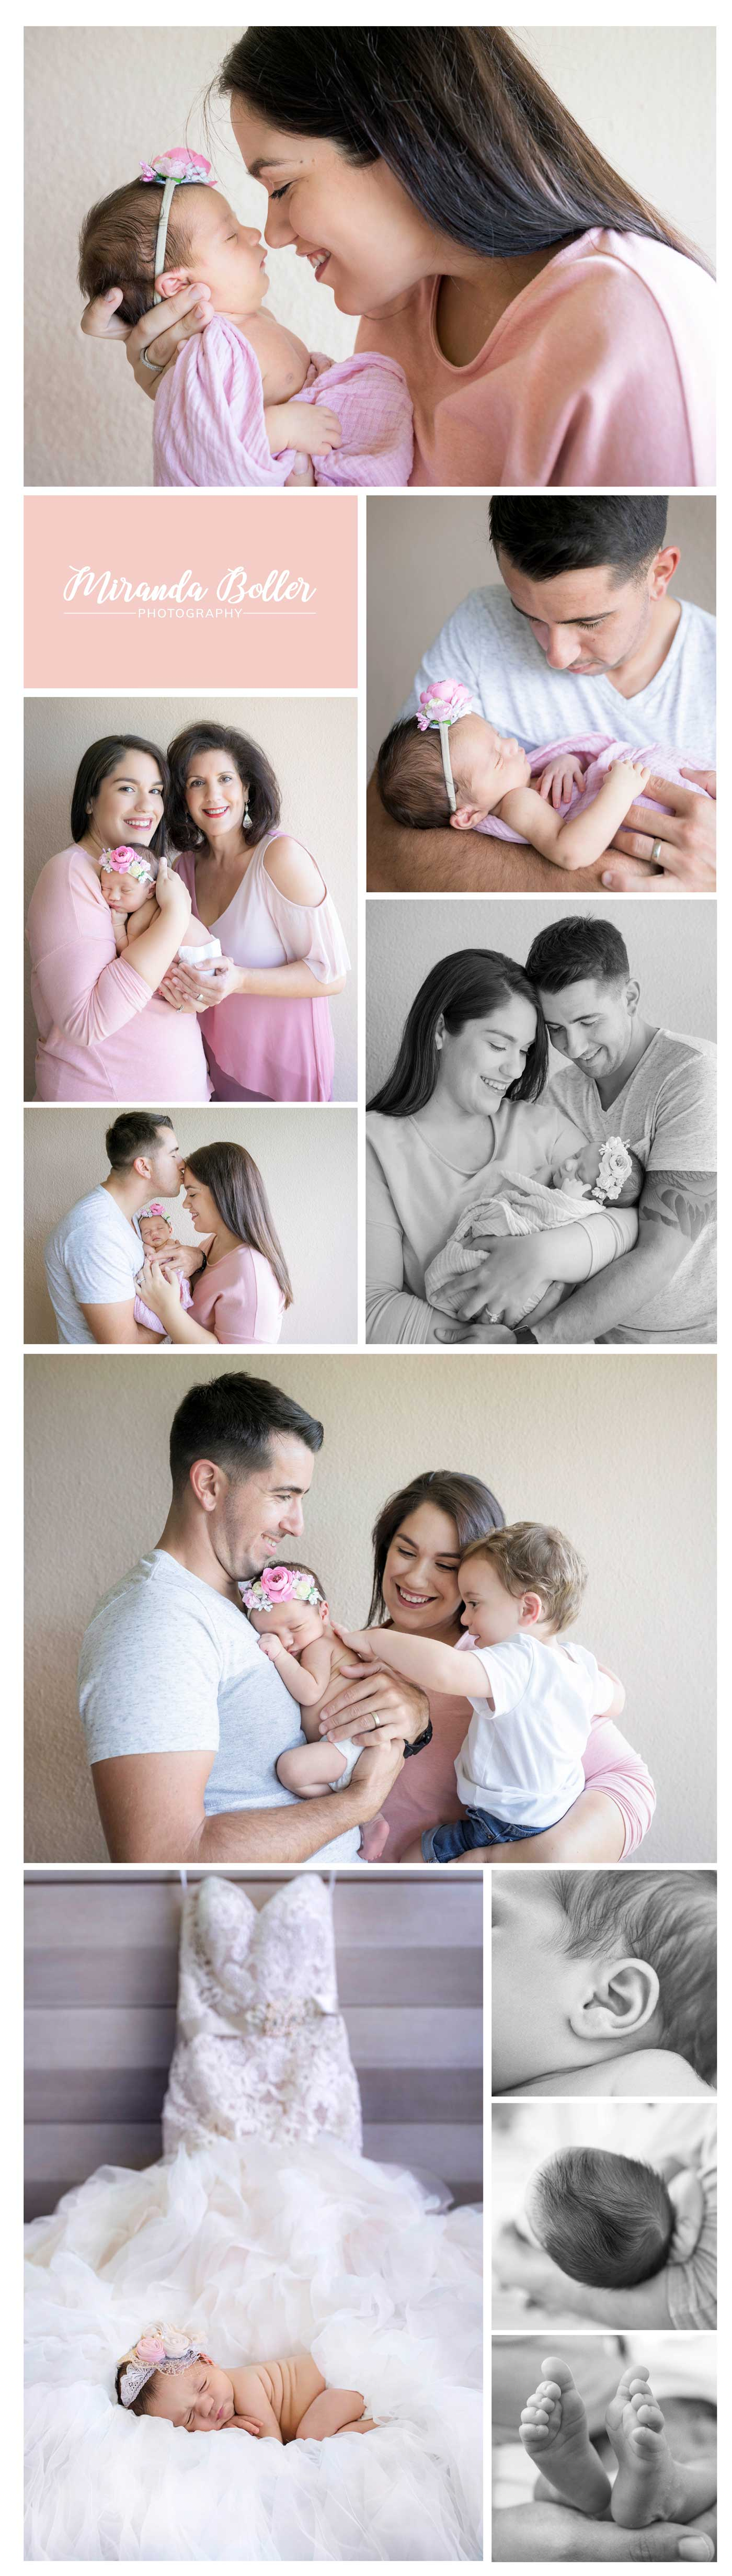 MaternityKeyWest-web.jpg